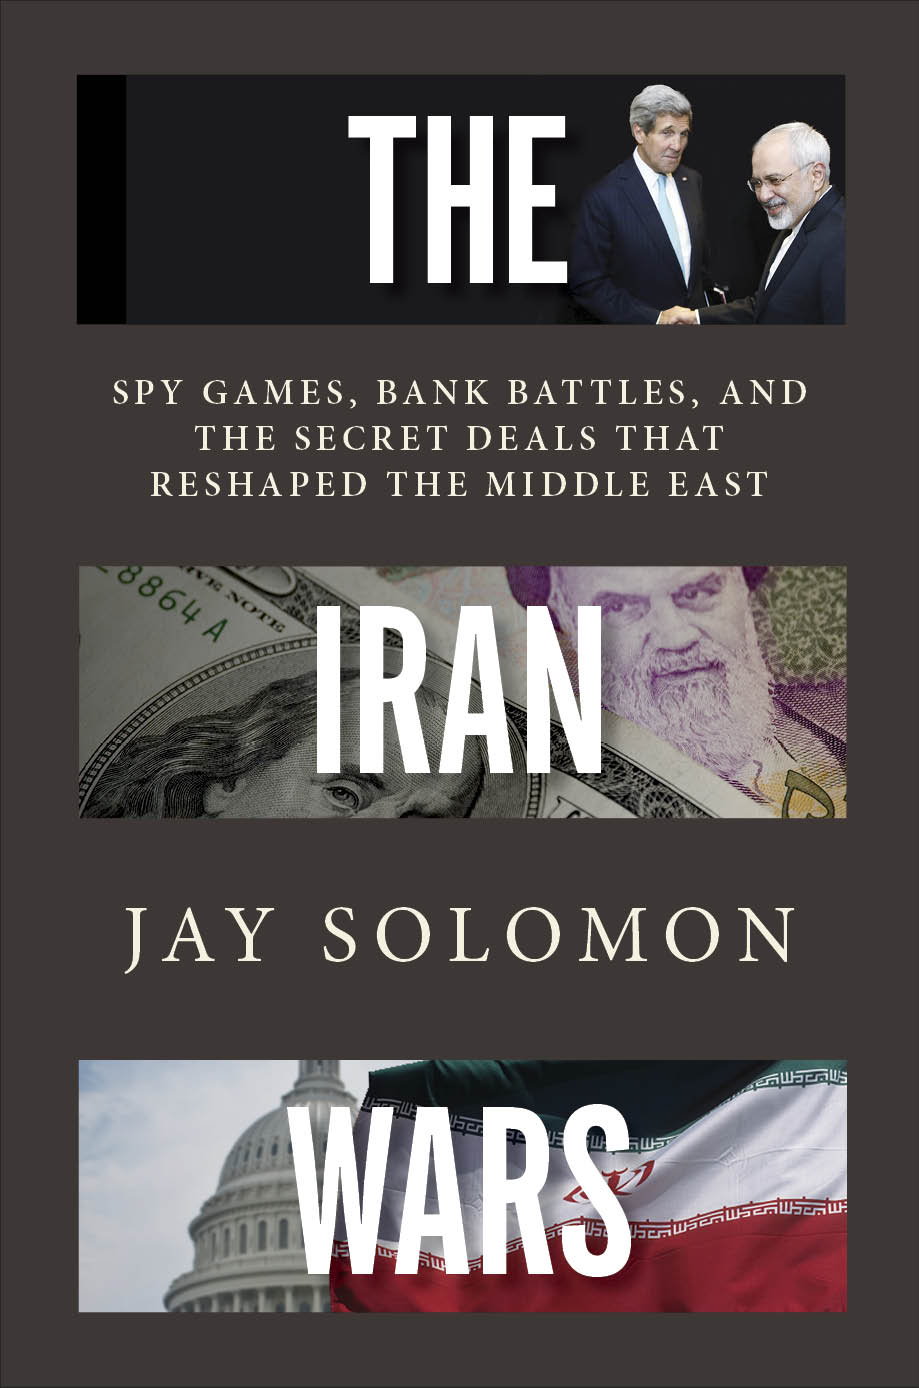 the_iran_wars_jay_solomon.JPG